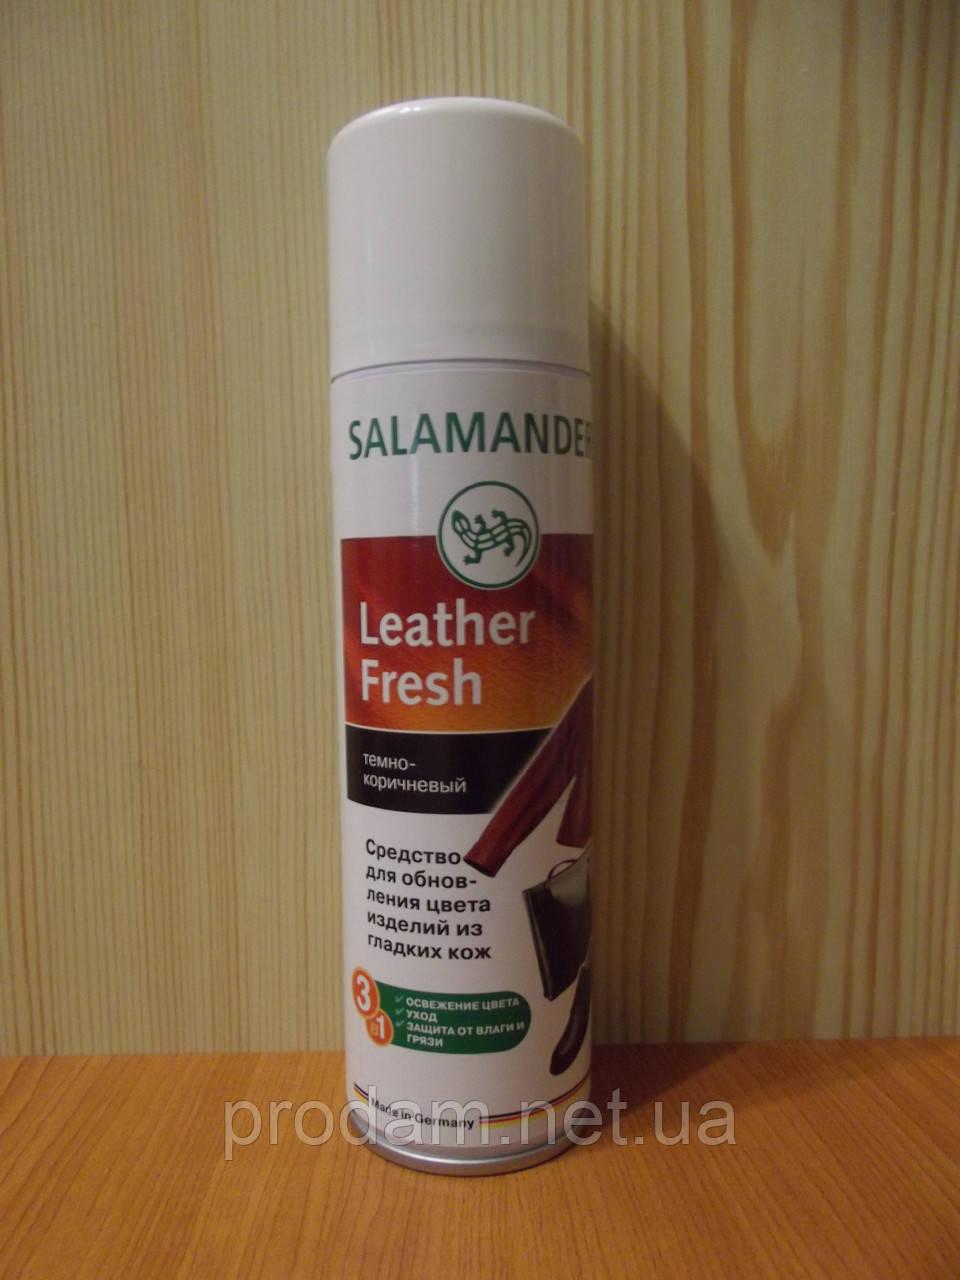 Salamander Аерозоль Velour Професіонал 250 мл 8281 - 018 чорний